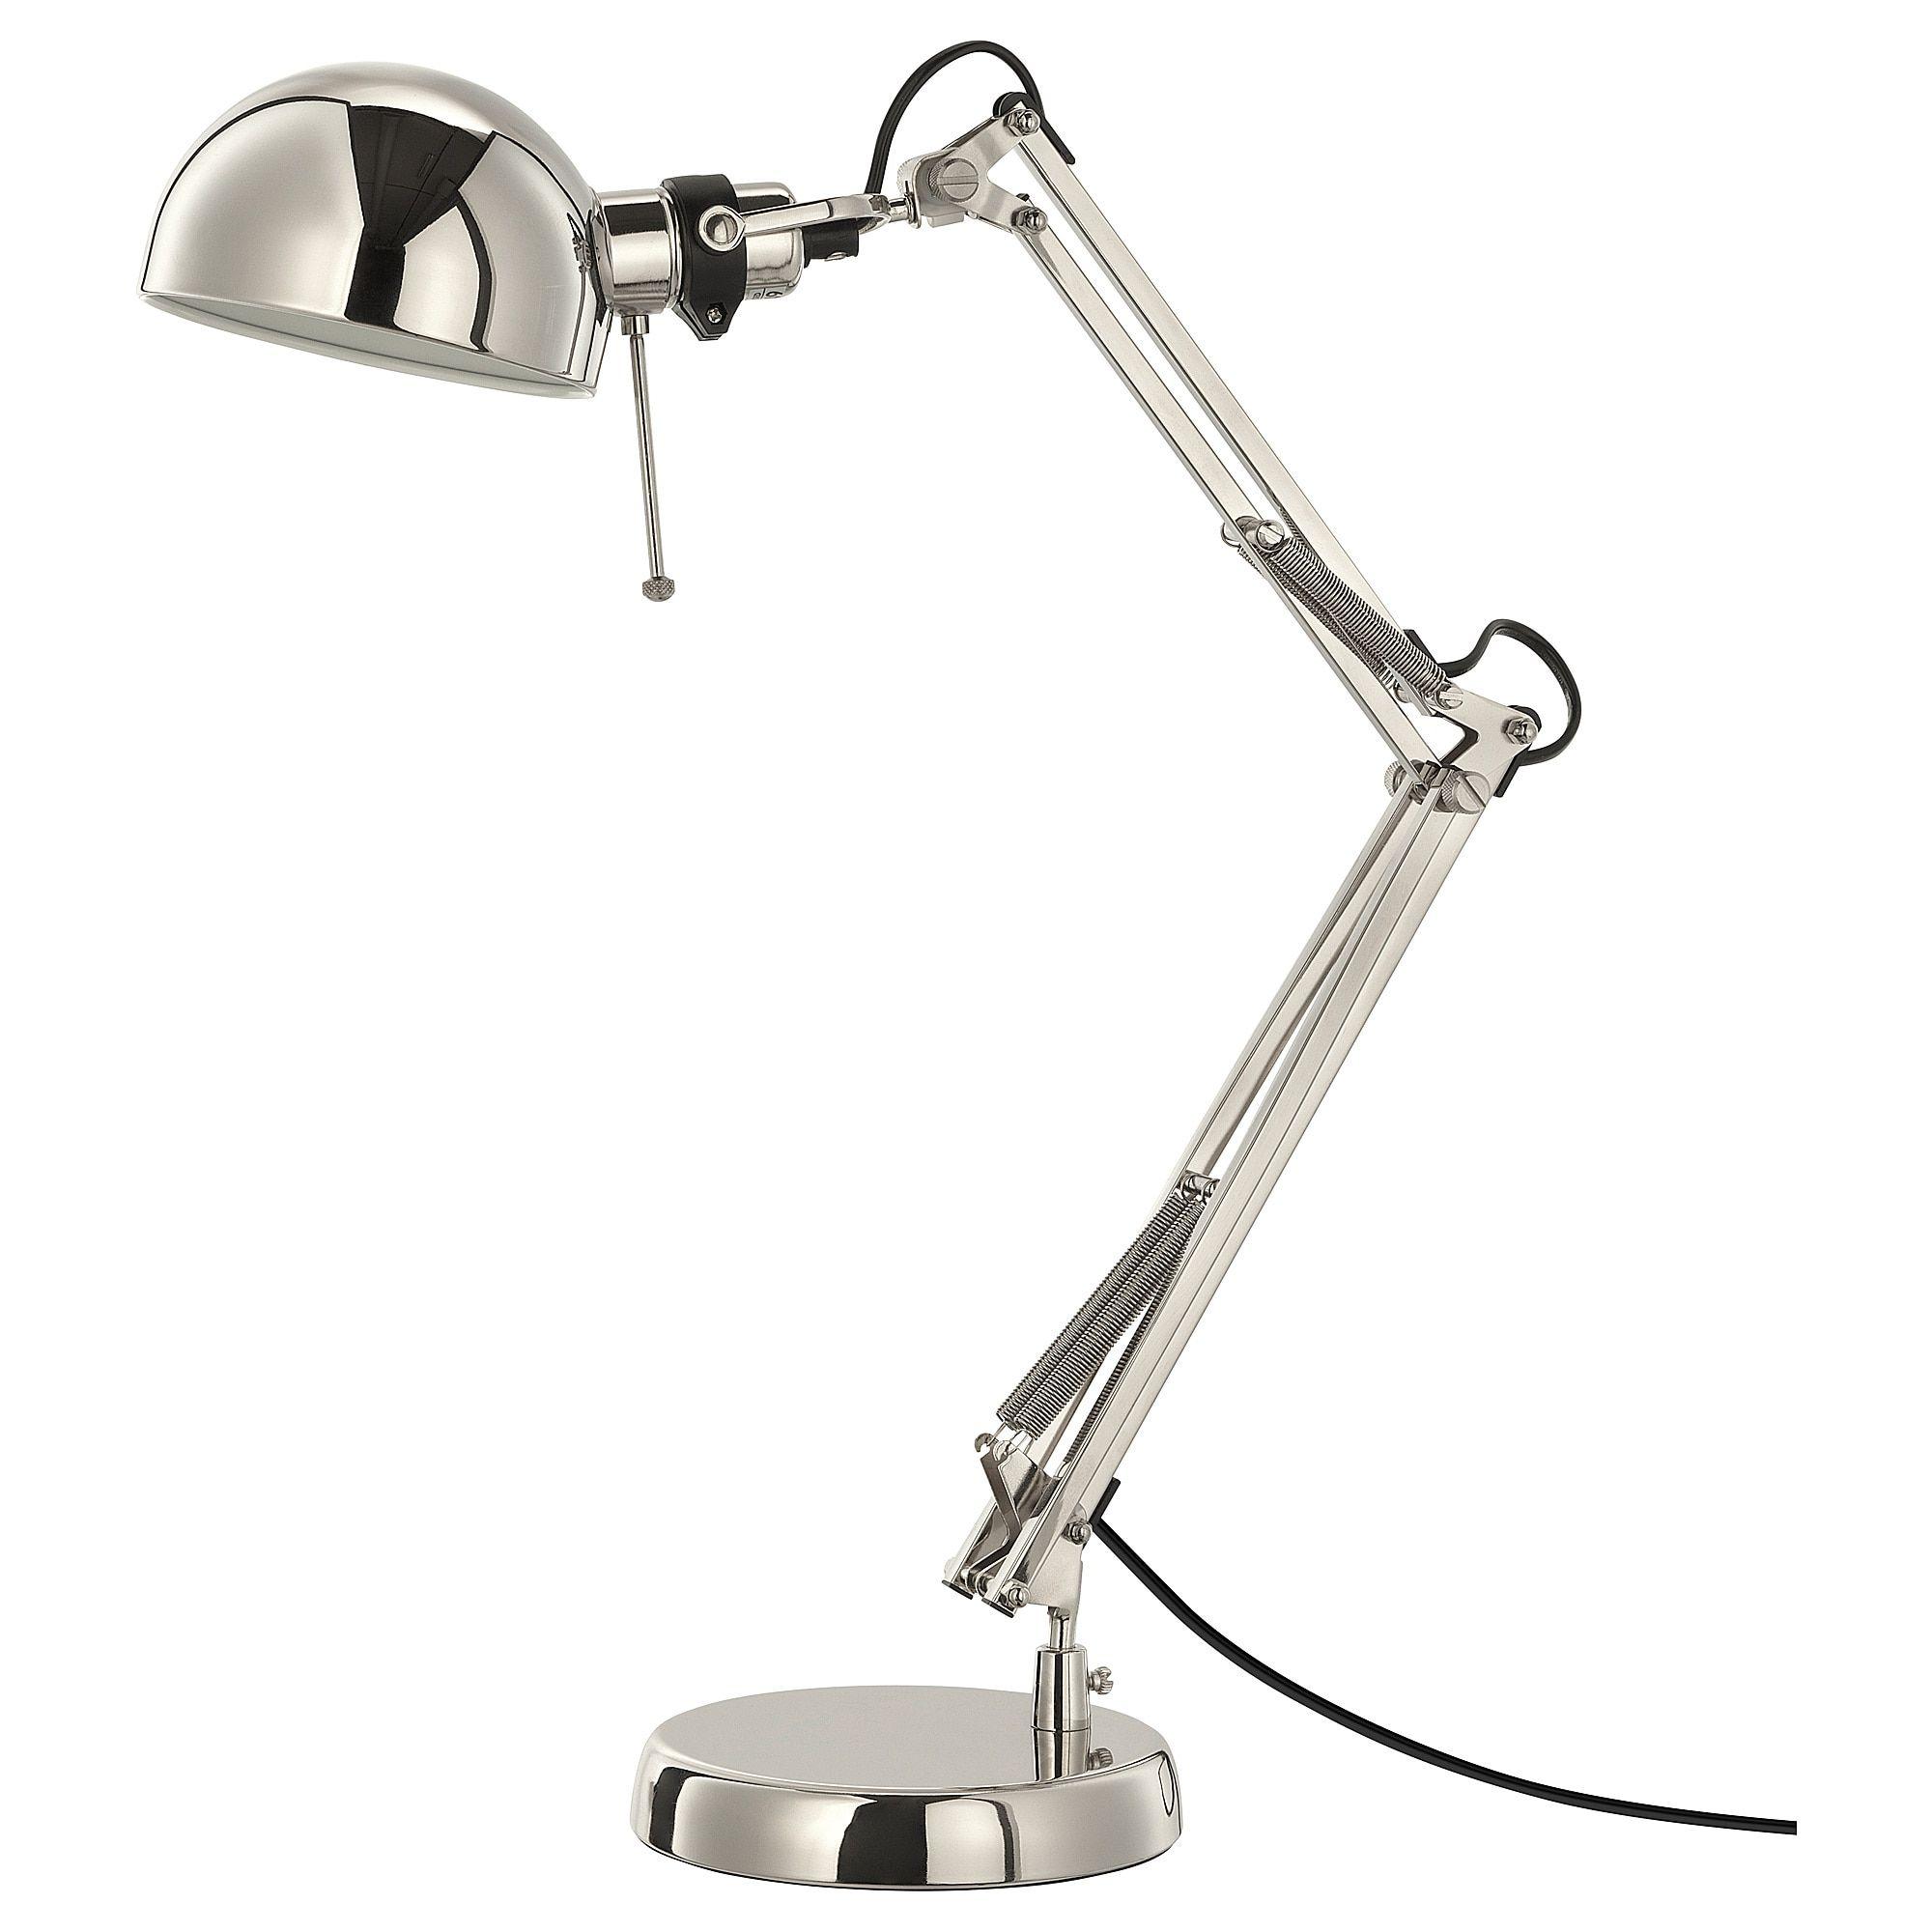 Forsa Lampe De Bureau Nickele Ikea In 2020 Arbeitsleuchte Schreibtischlampe Led Lampe